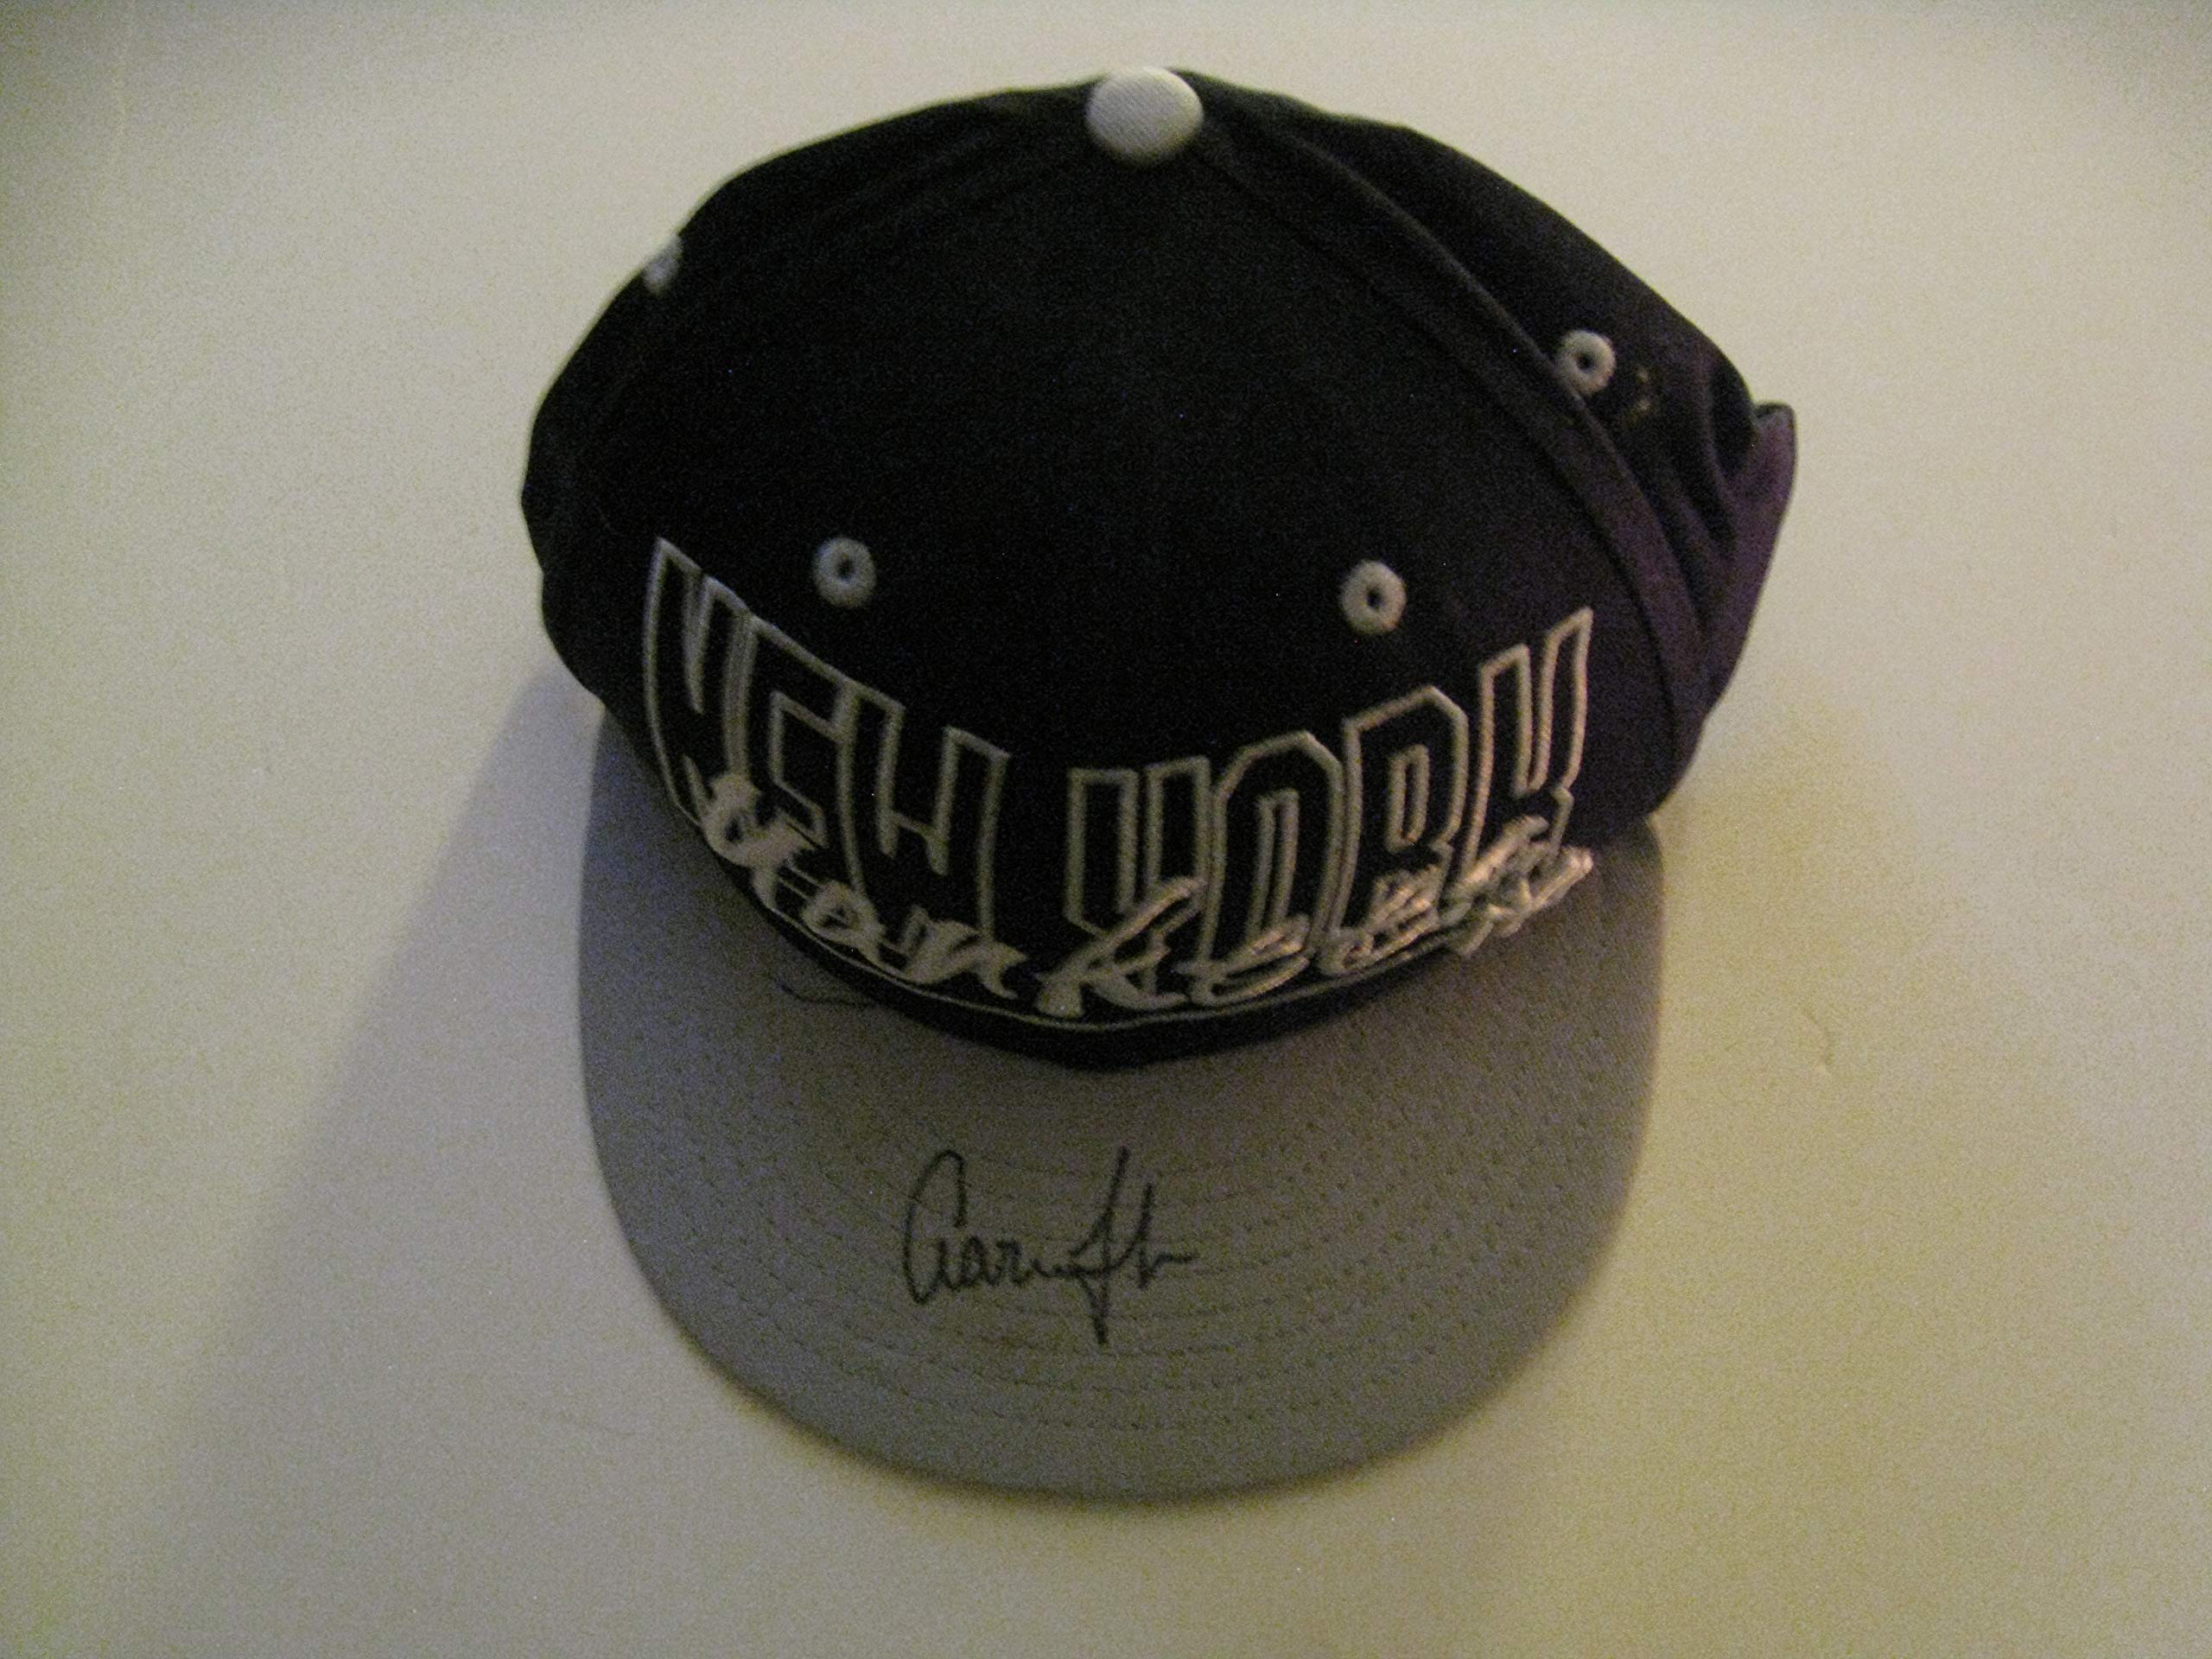 Aaron Judge Autographeed/Signed NY Yankees Hat COA